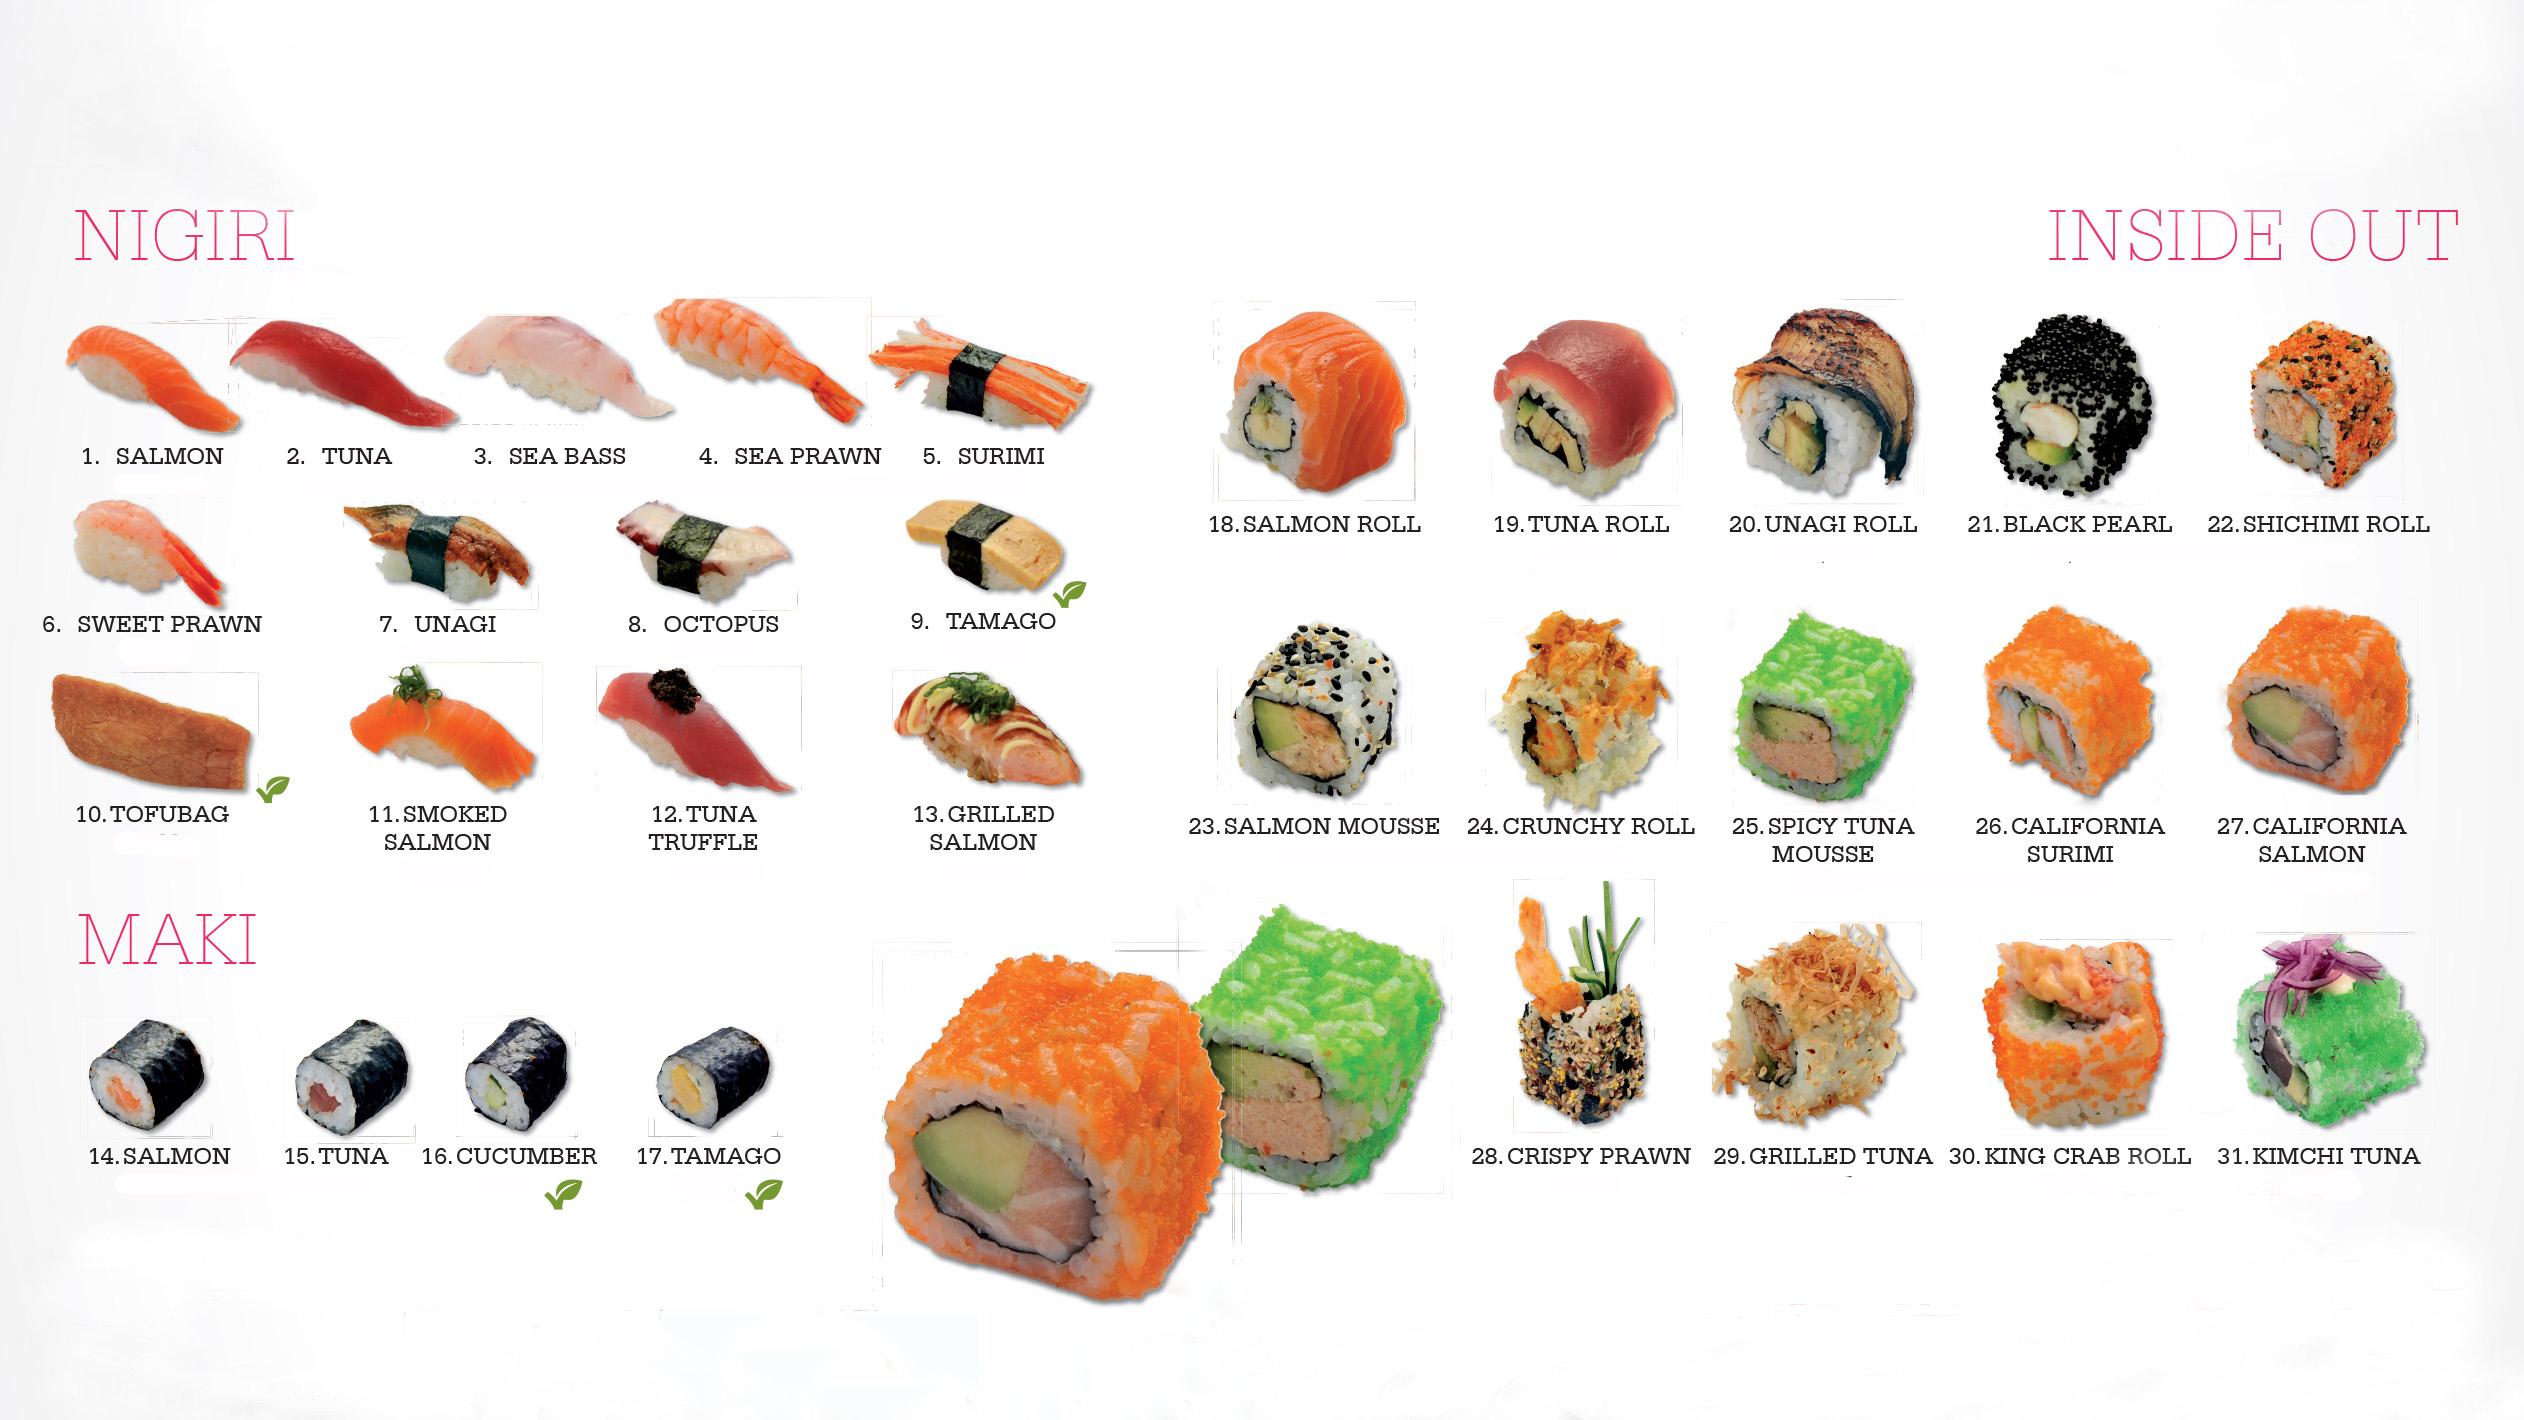 Sushi nigiri, Sushi maki, Sushi inside out maki ...